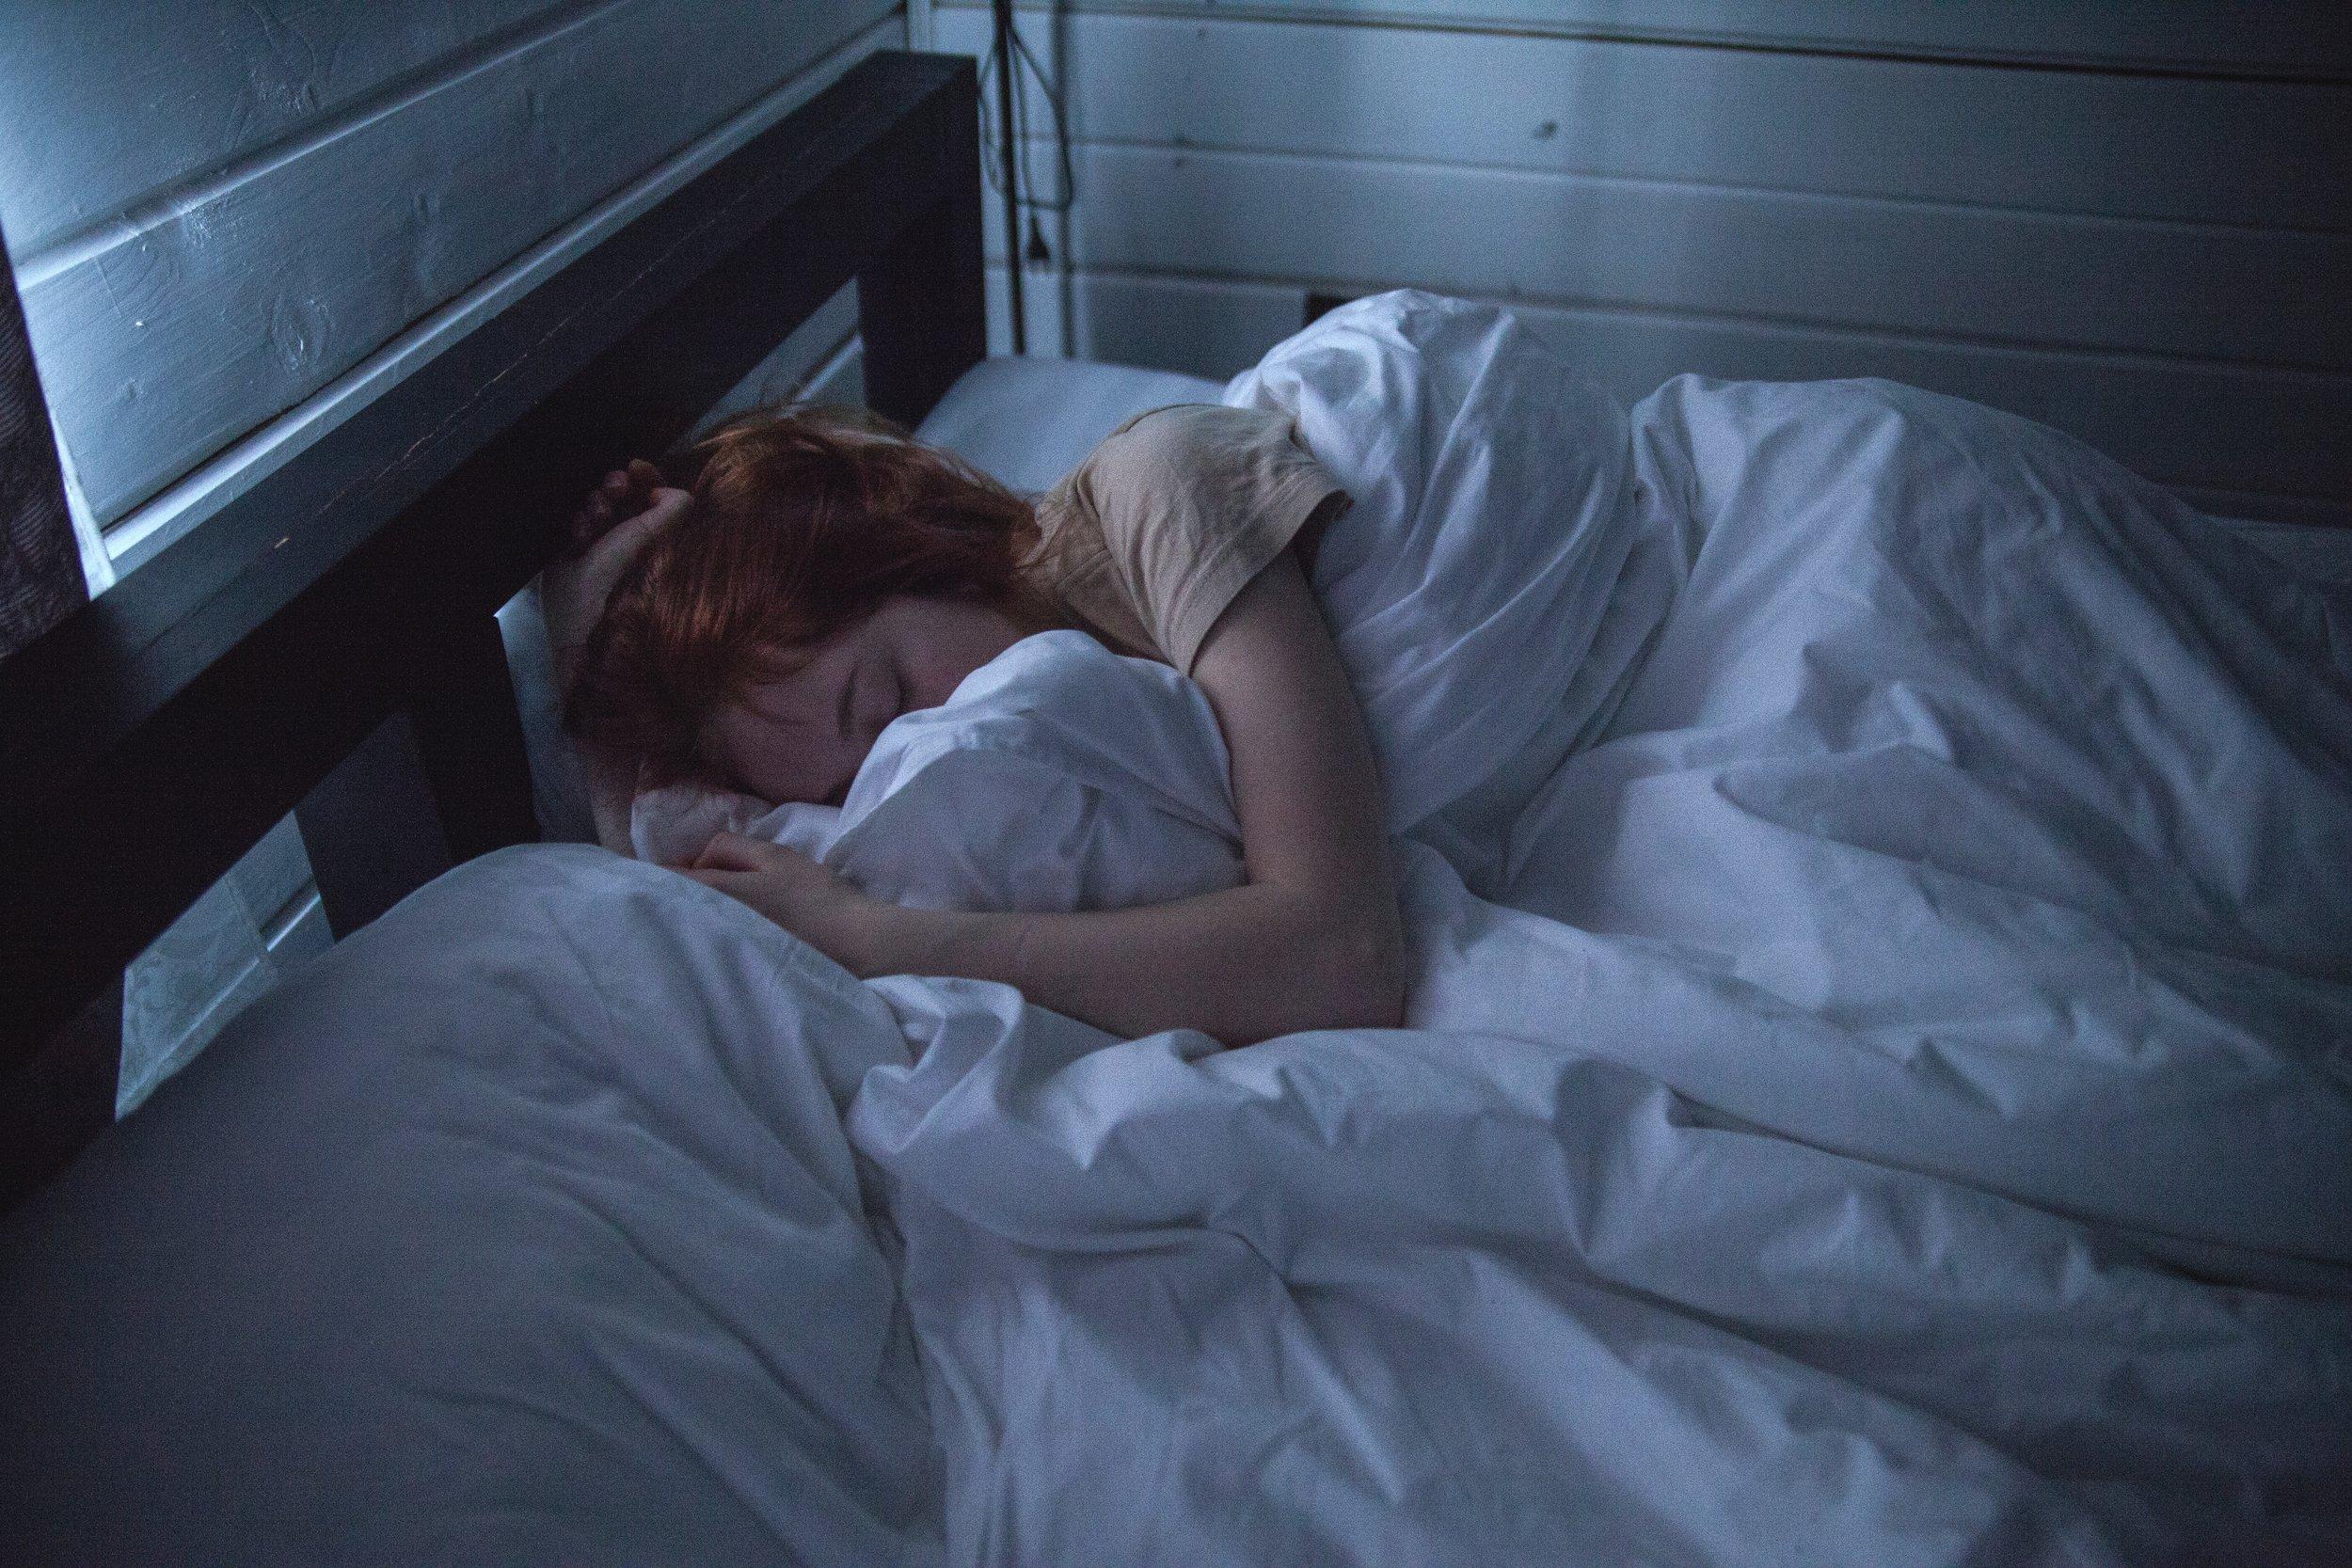 adult-asleep-bed-935777.jpg